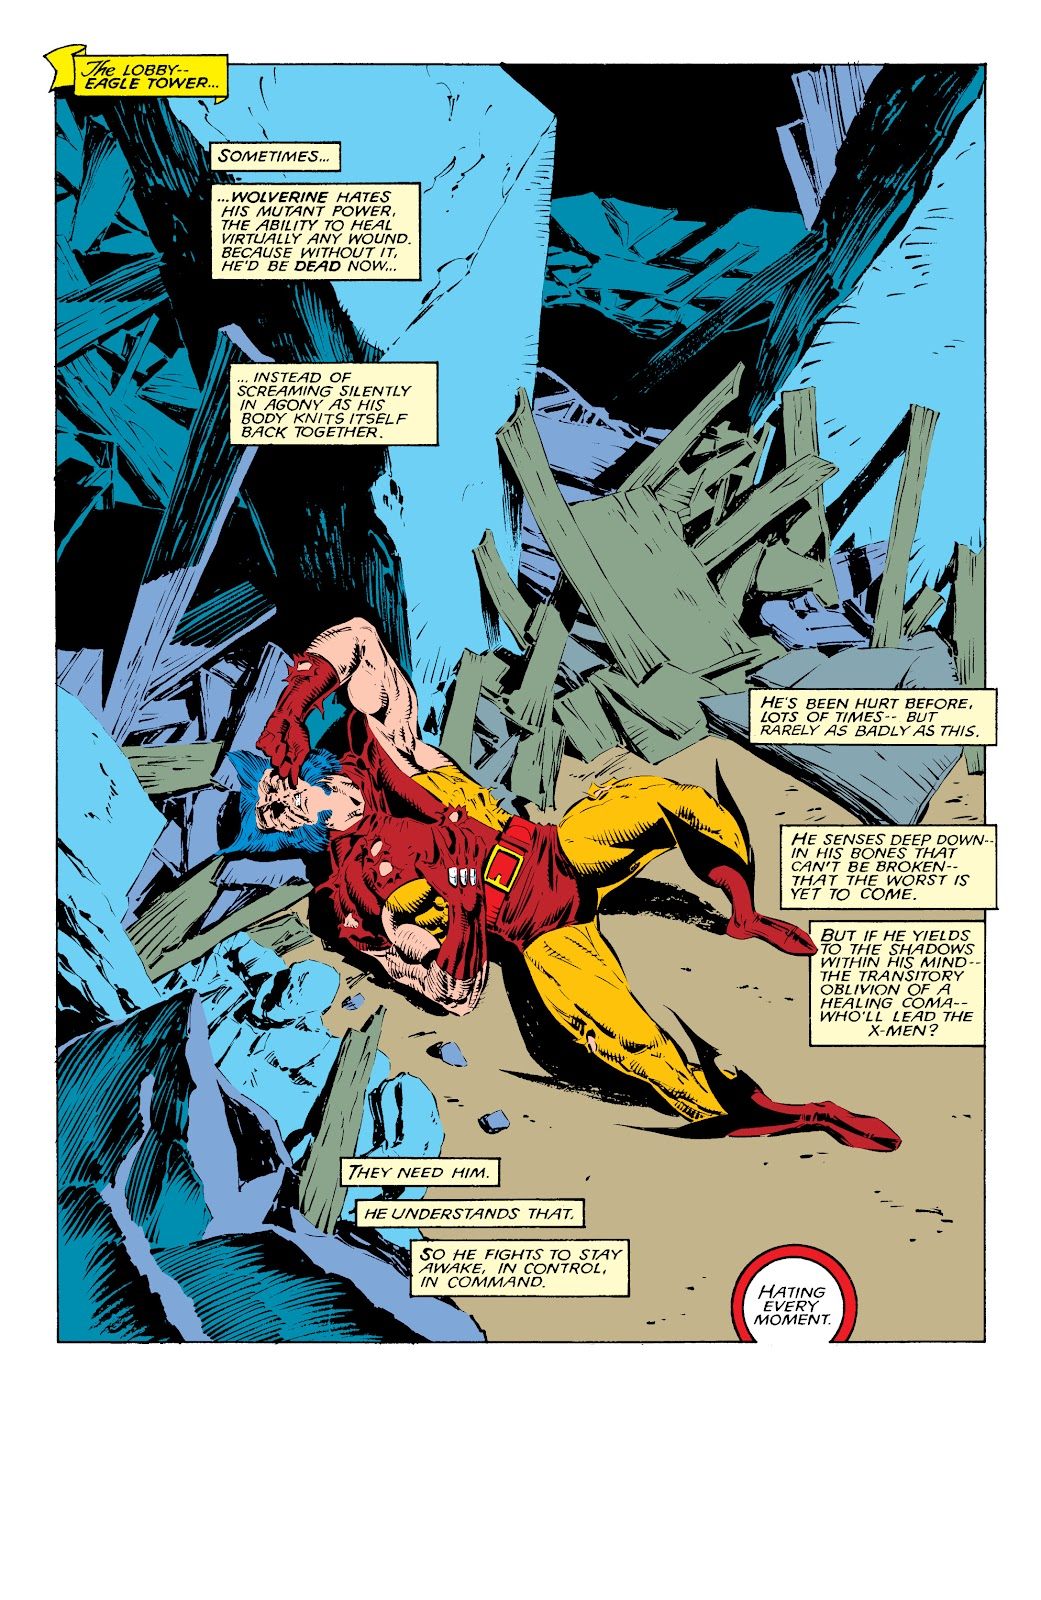 Read online X-Men Milestones: Fall of the Mutants comic -  Issue # TPB (Part 1) - 28